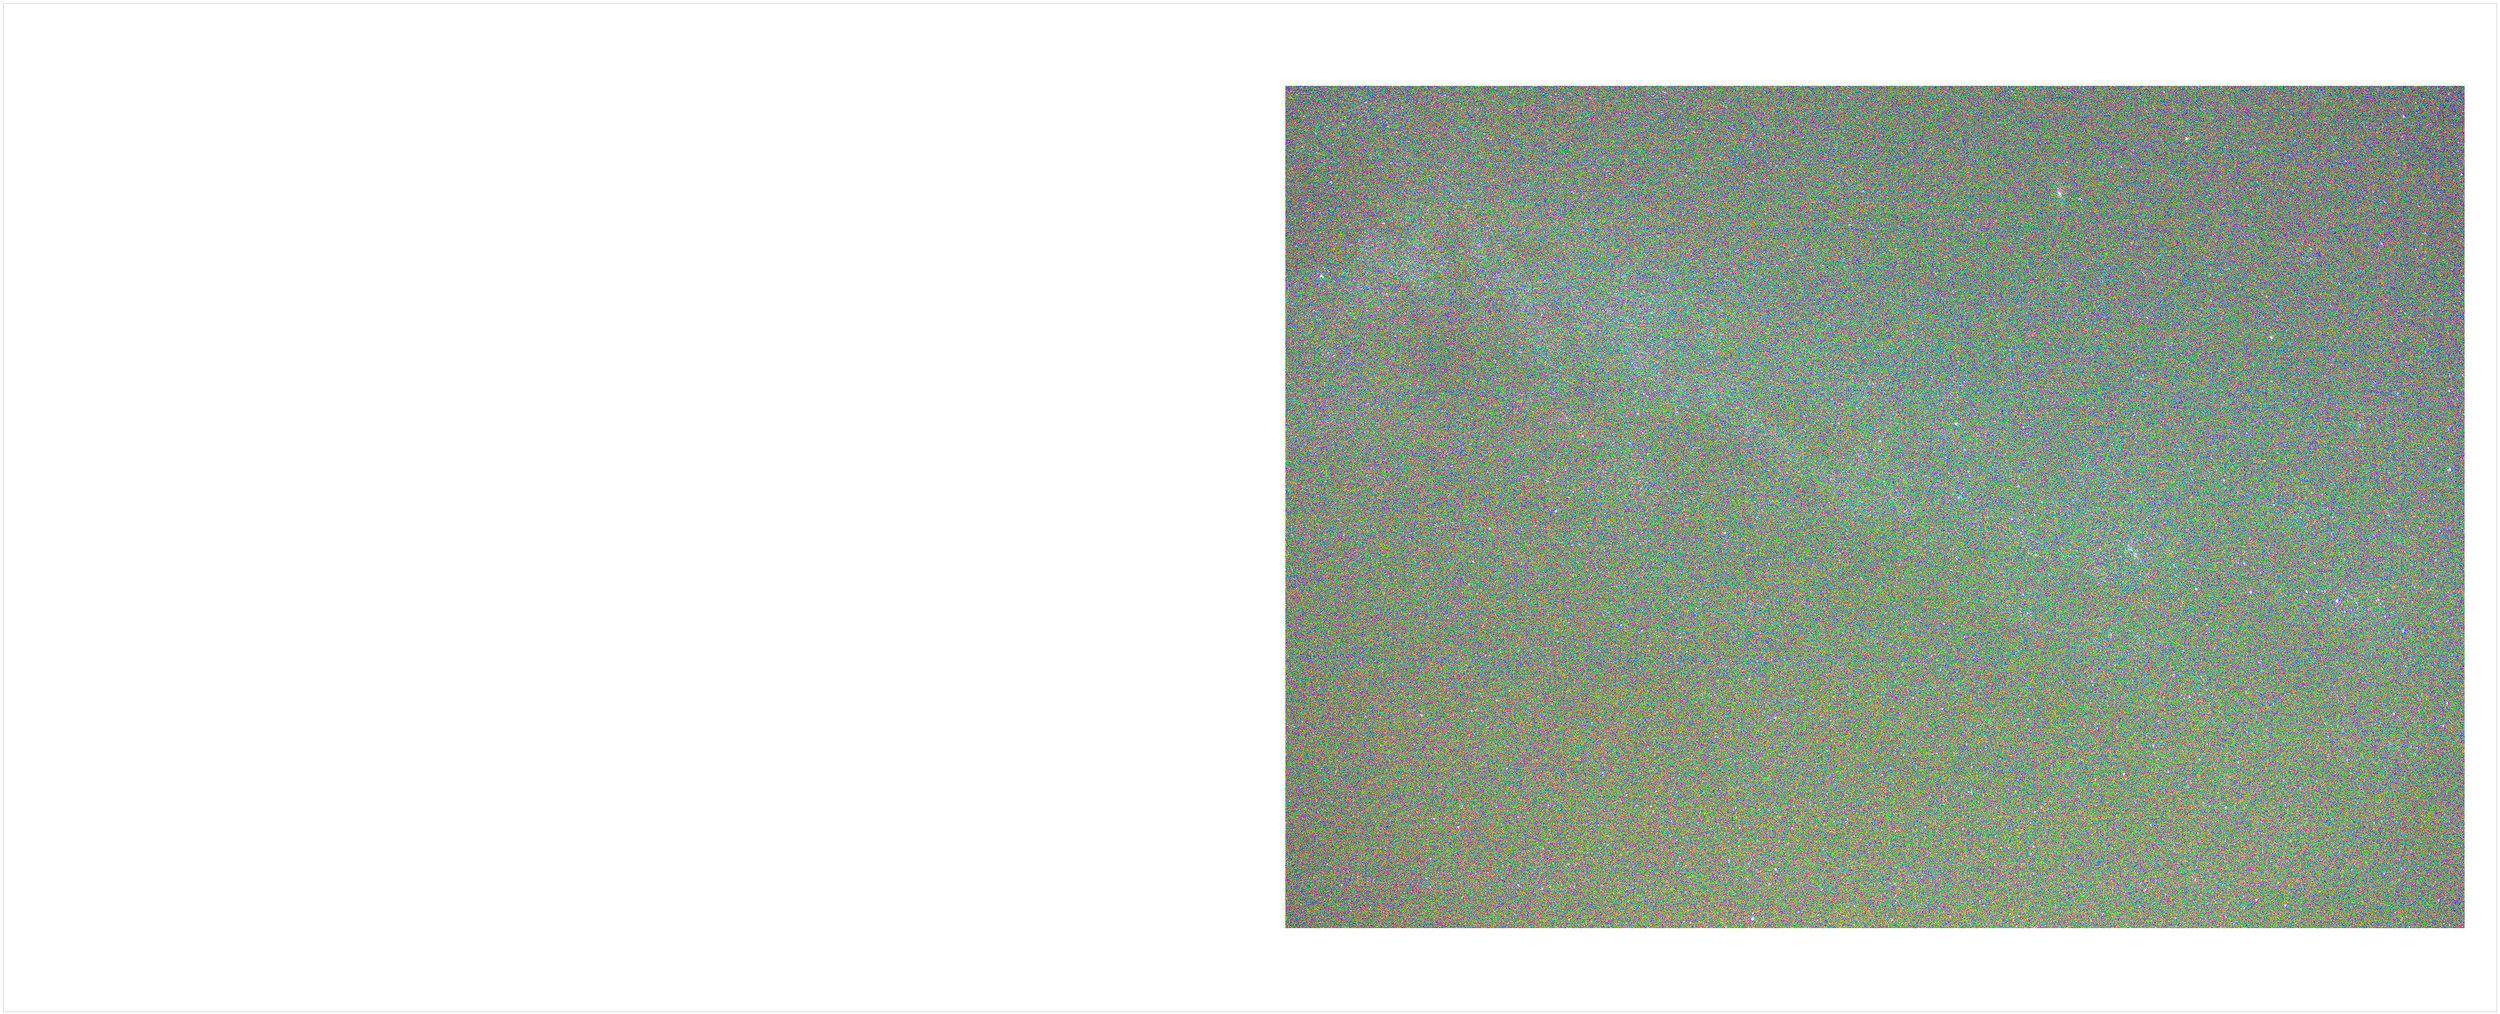 sn-2.jpg